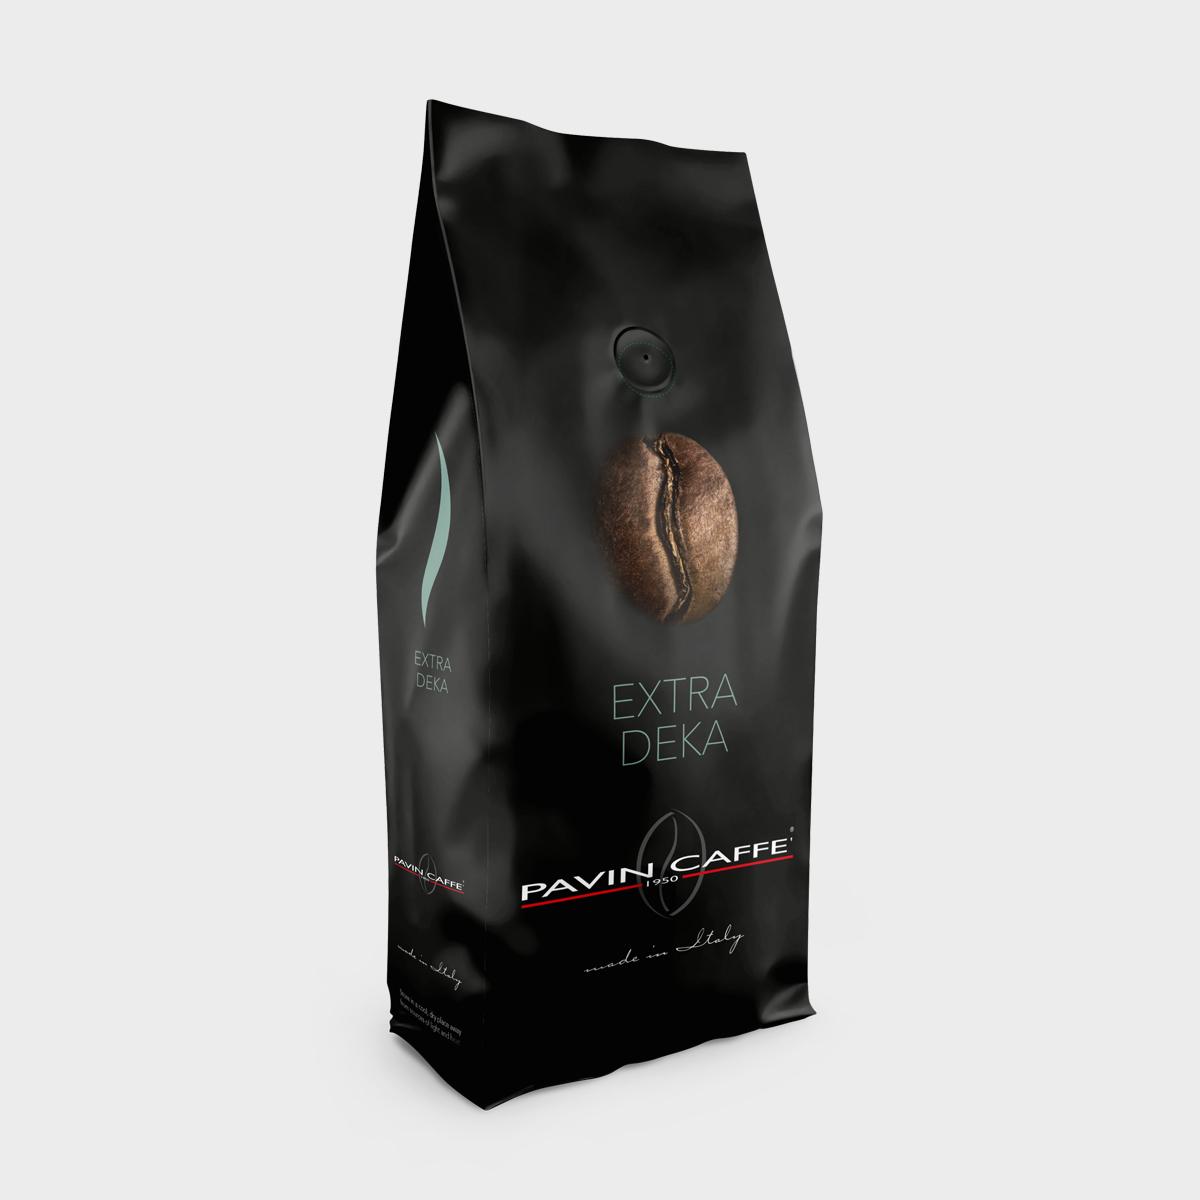 miscela-extra-deka-1kg-caffe-pavin